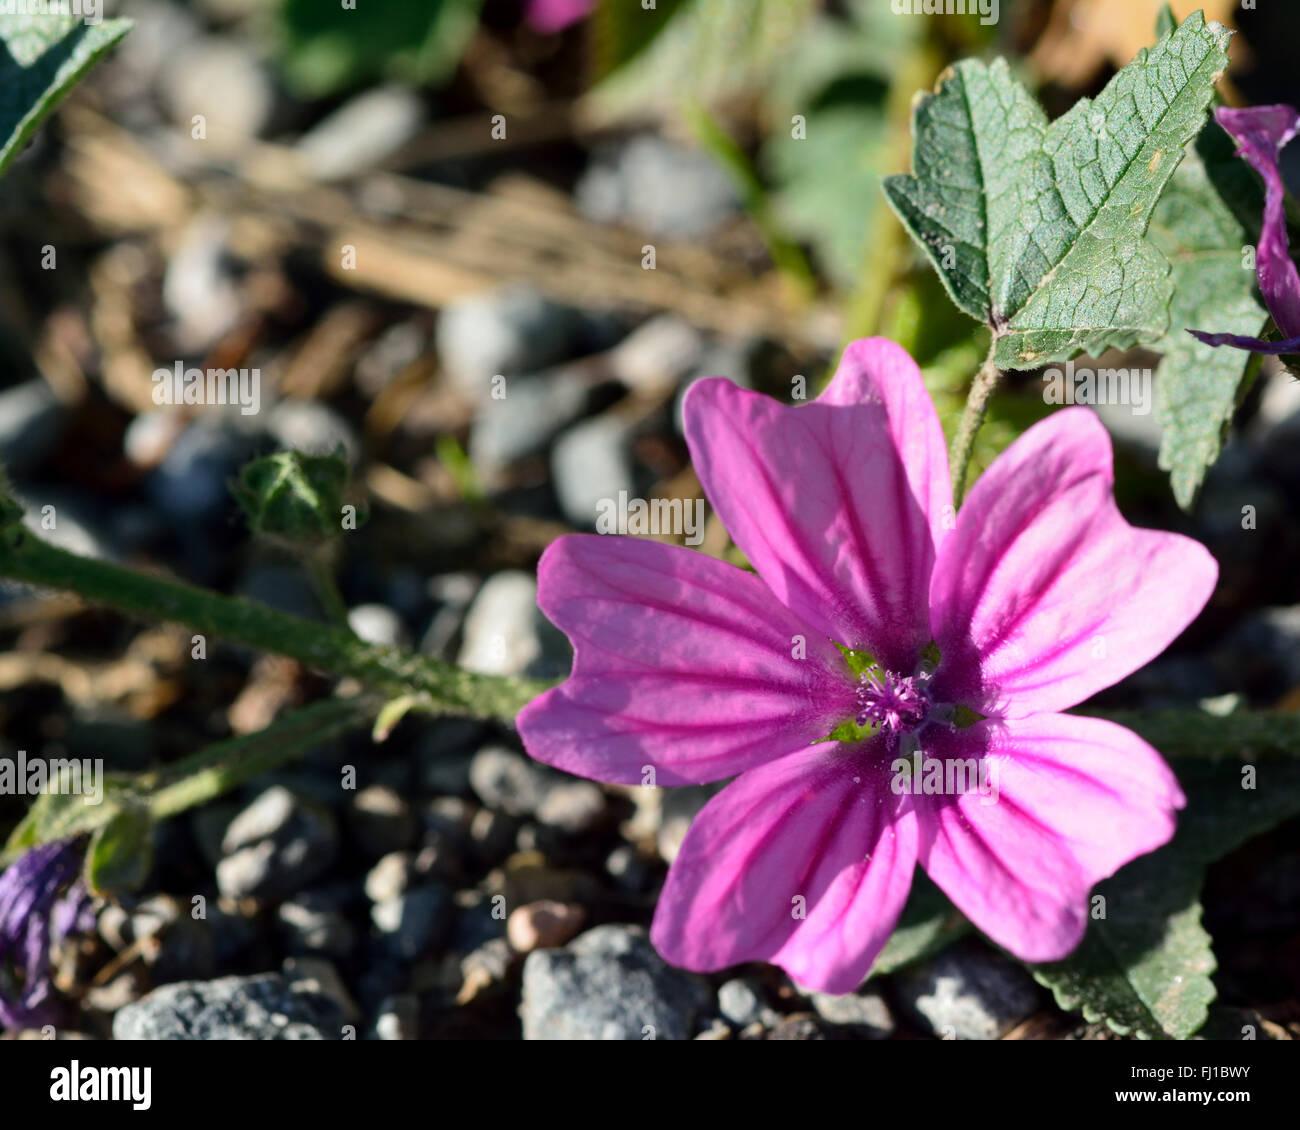 Common mallow malva sylvestris a pink flower of a plant in the common mallow malva sylvestris a pink flower of a plant in the family malvaceae mightylinksfo